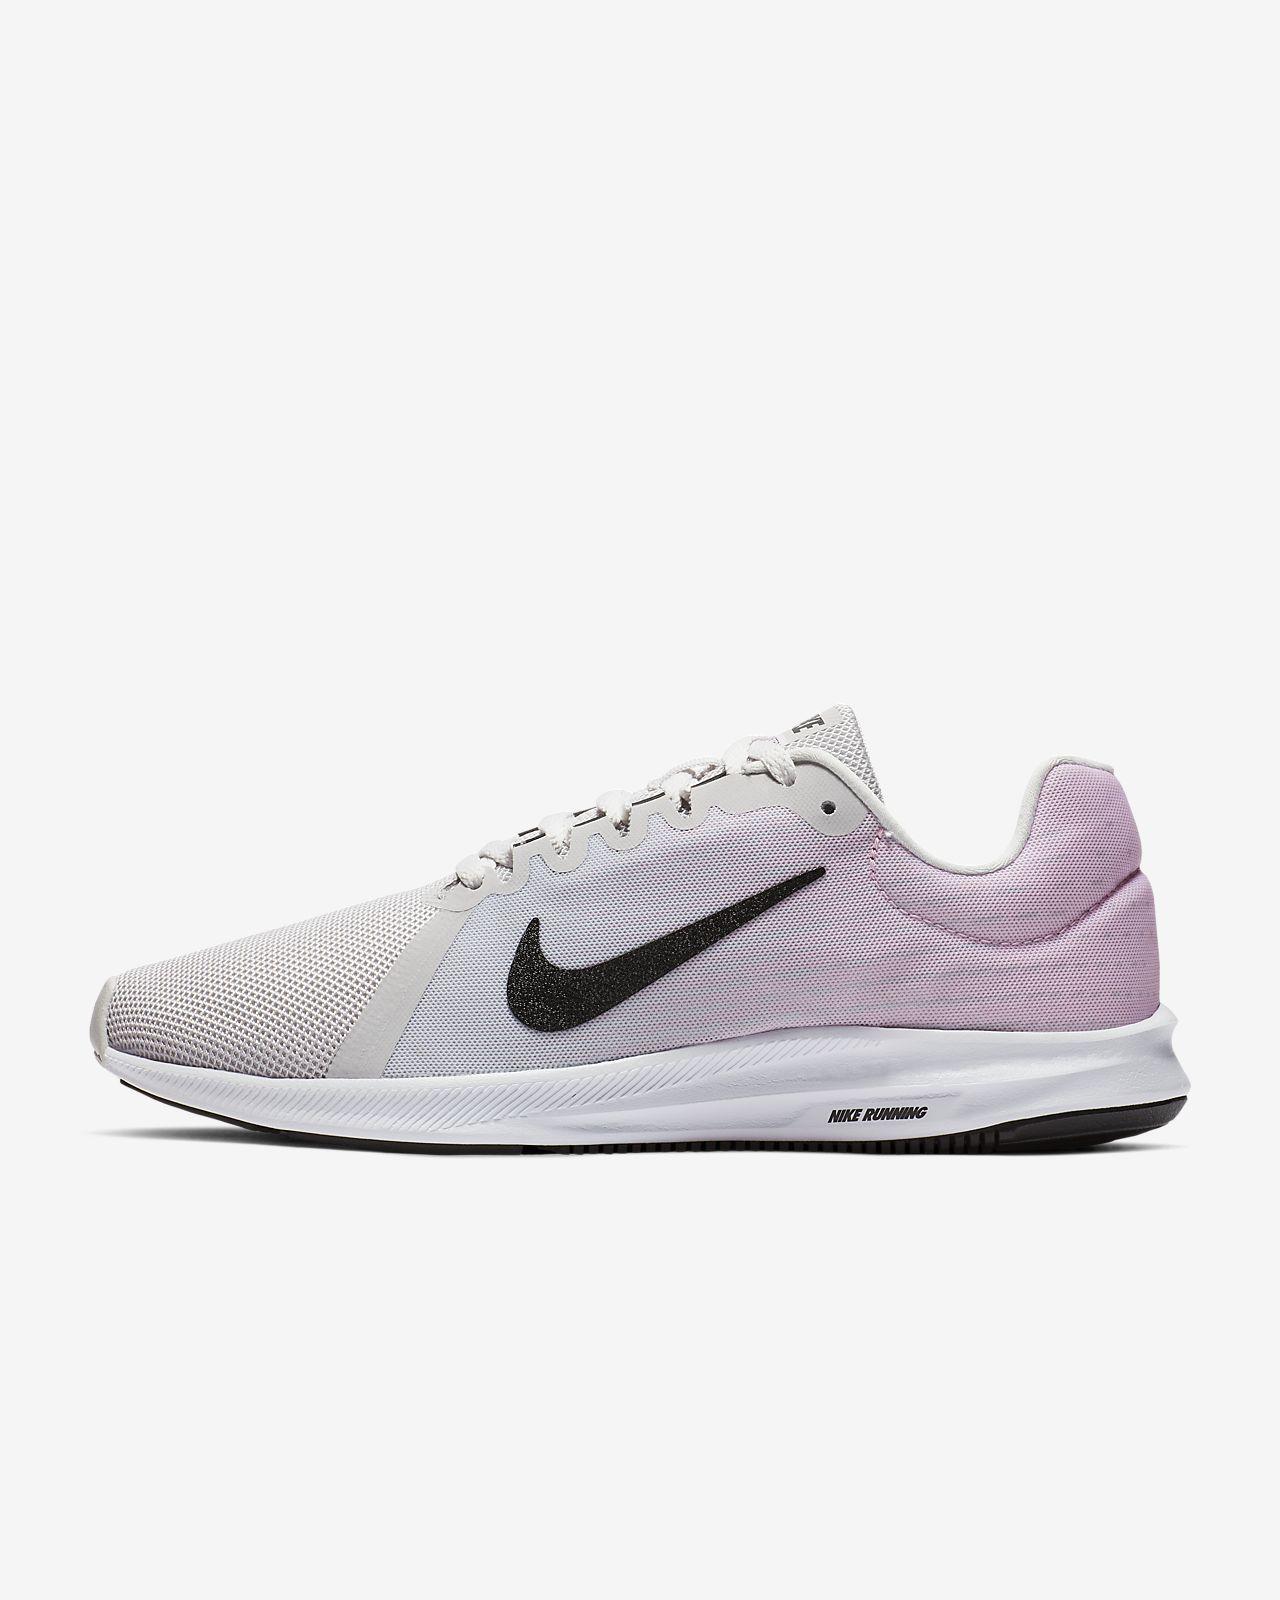 Nike Cl Calzado Mujer Downshifter Para Running De 8 qn4Uw4IP0